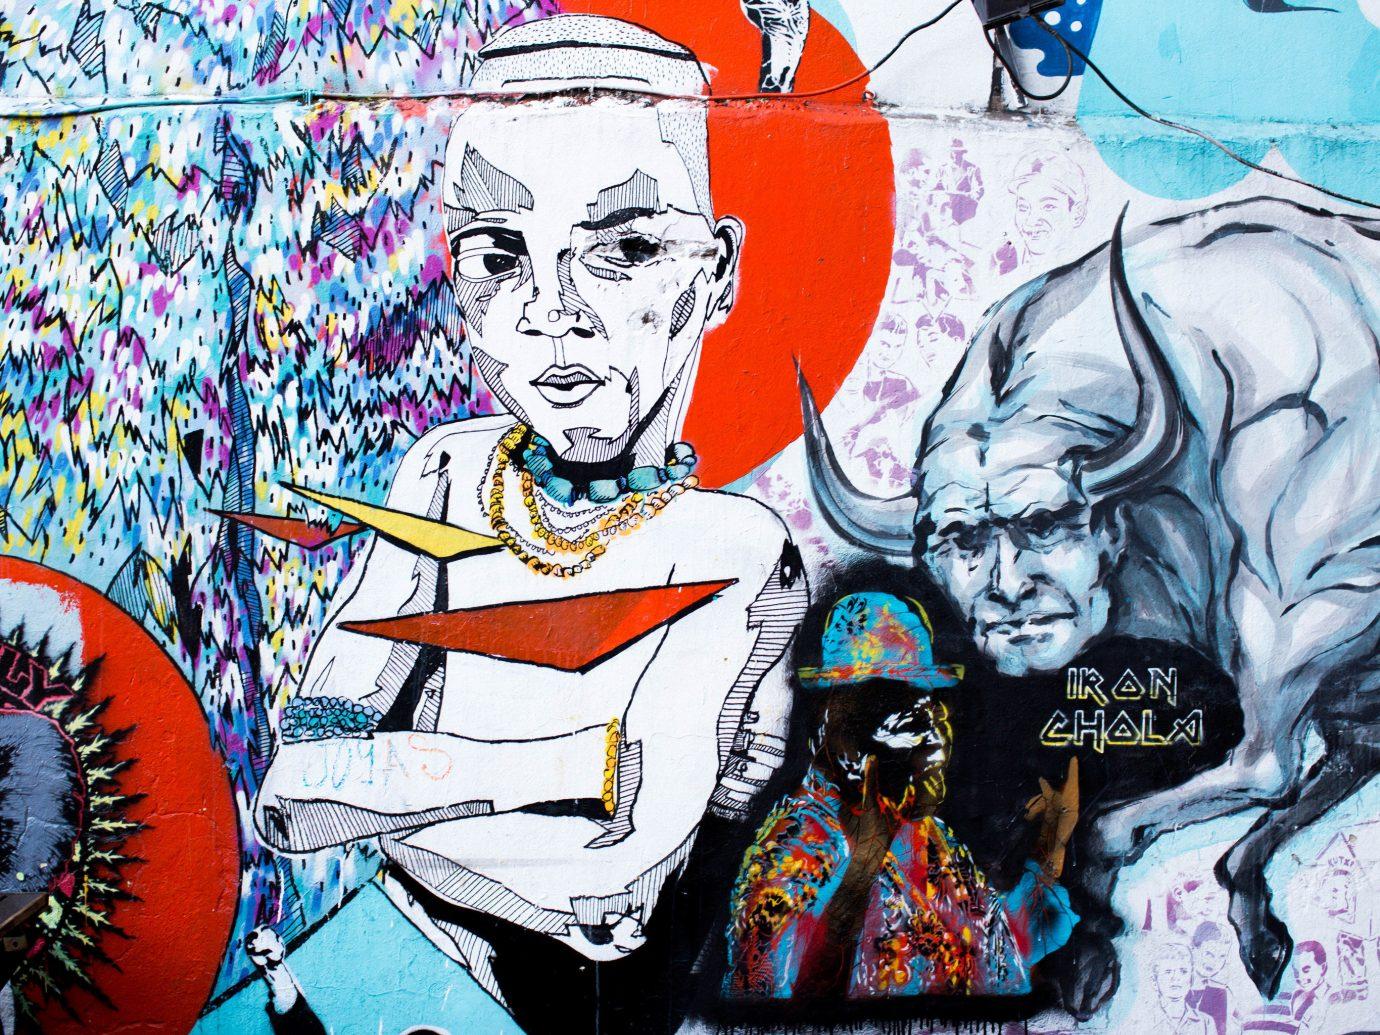 Trip Ideas art mural street art comic book graffiti modern art illustration colorful